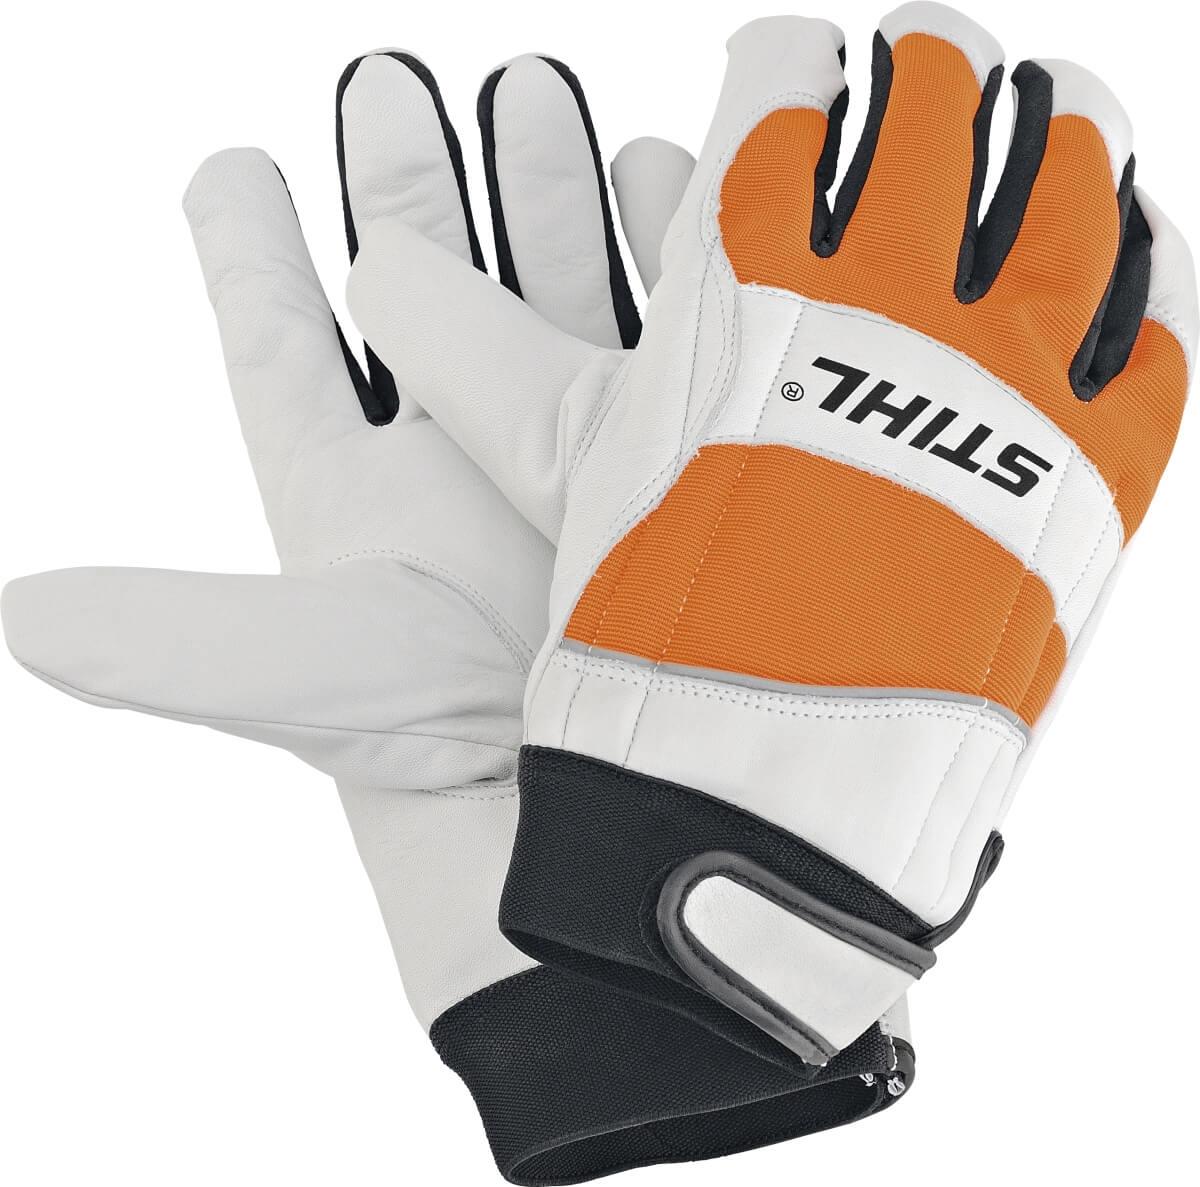 Handske Stihl Dynamic Protect MS, Vit/orange